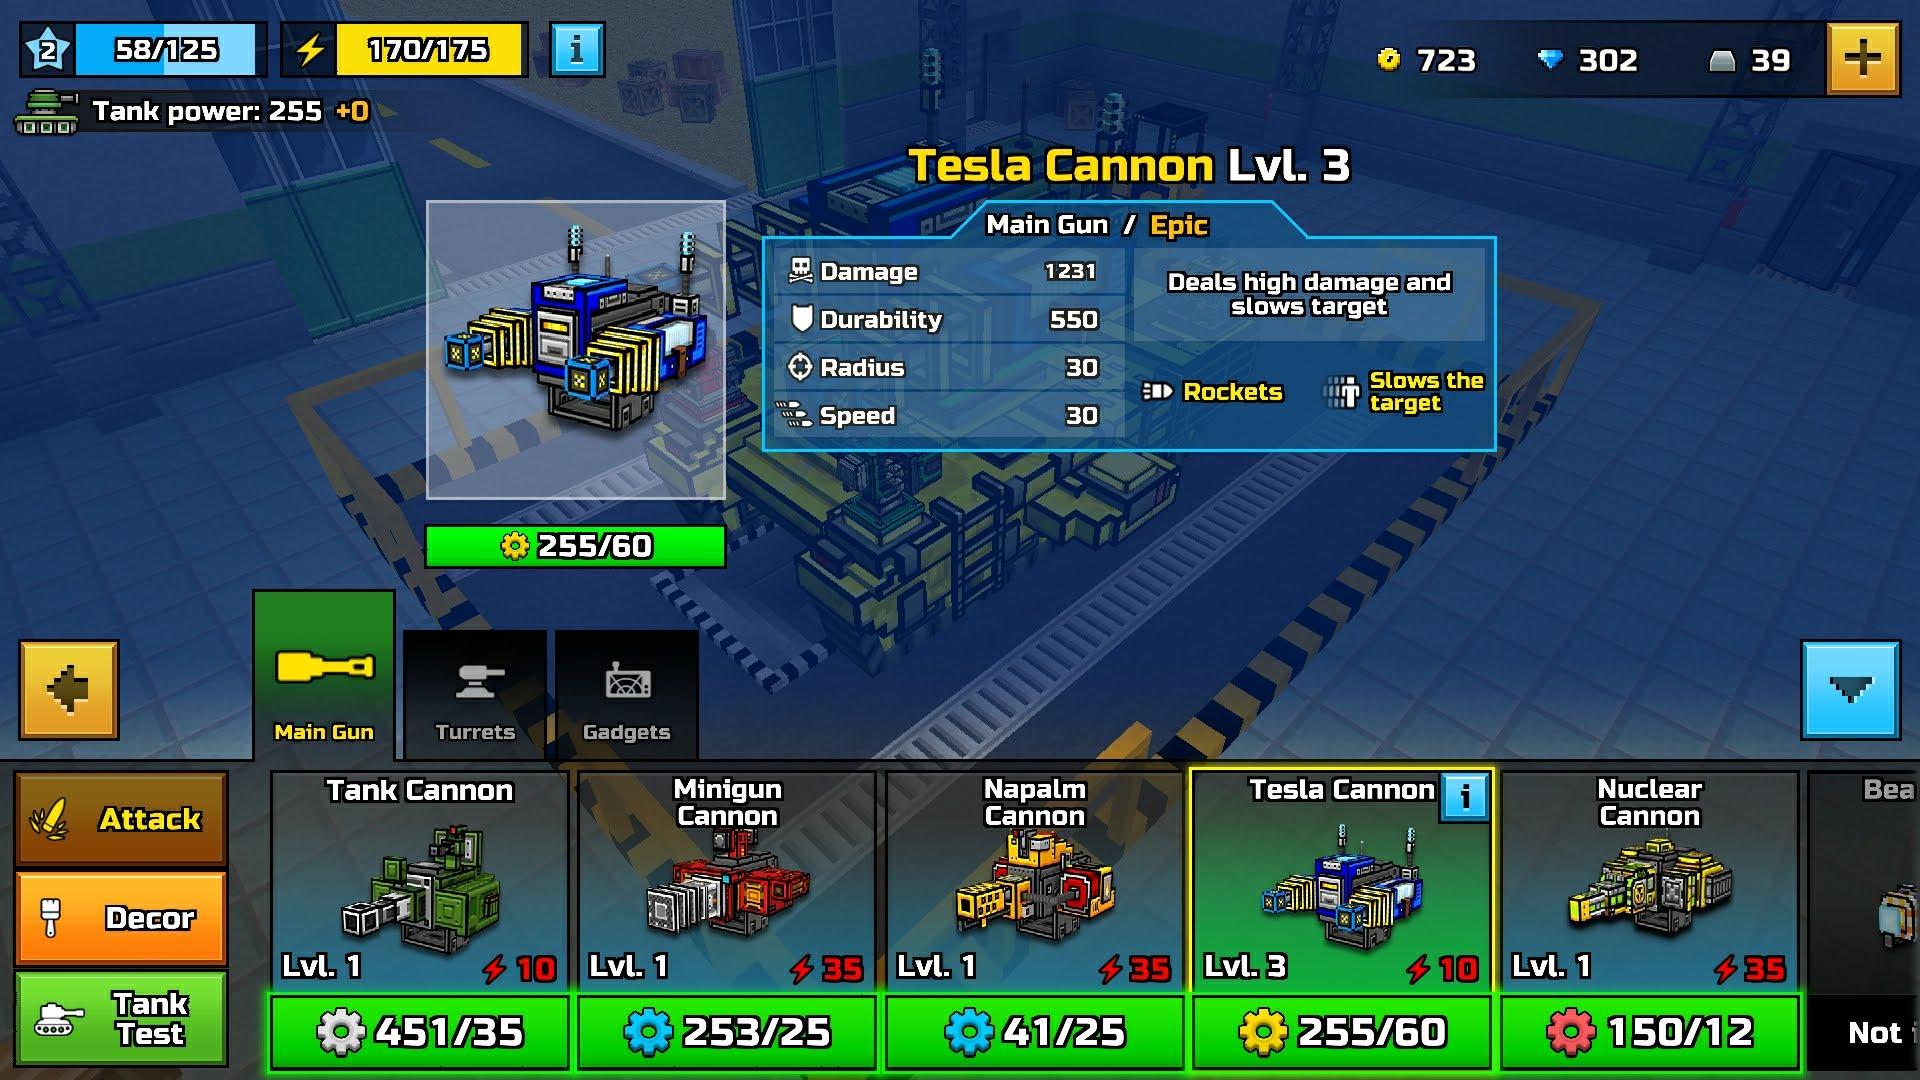 Tesla Cannon (Tank)